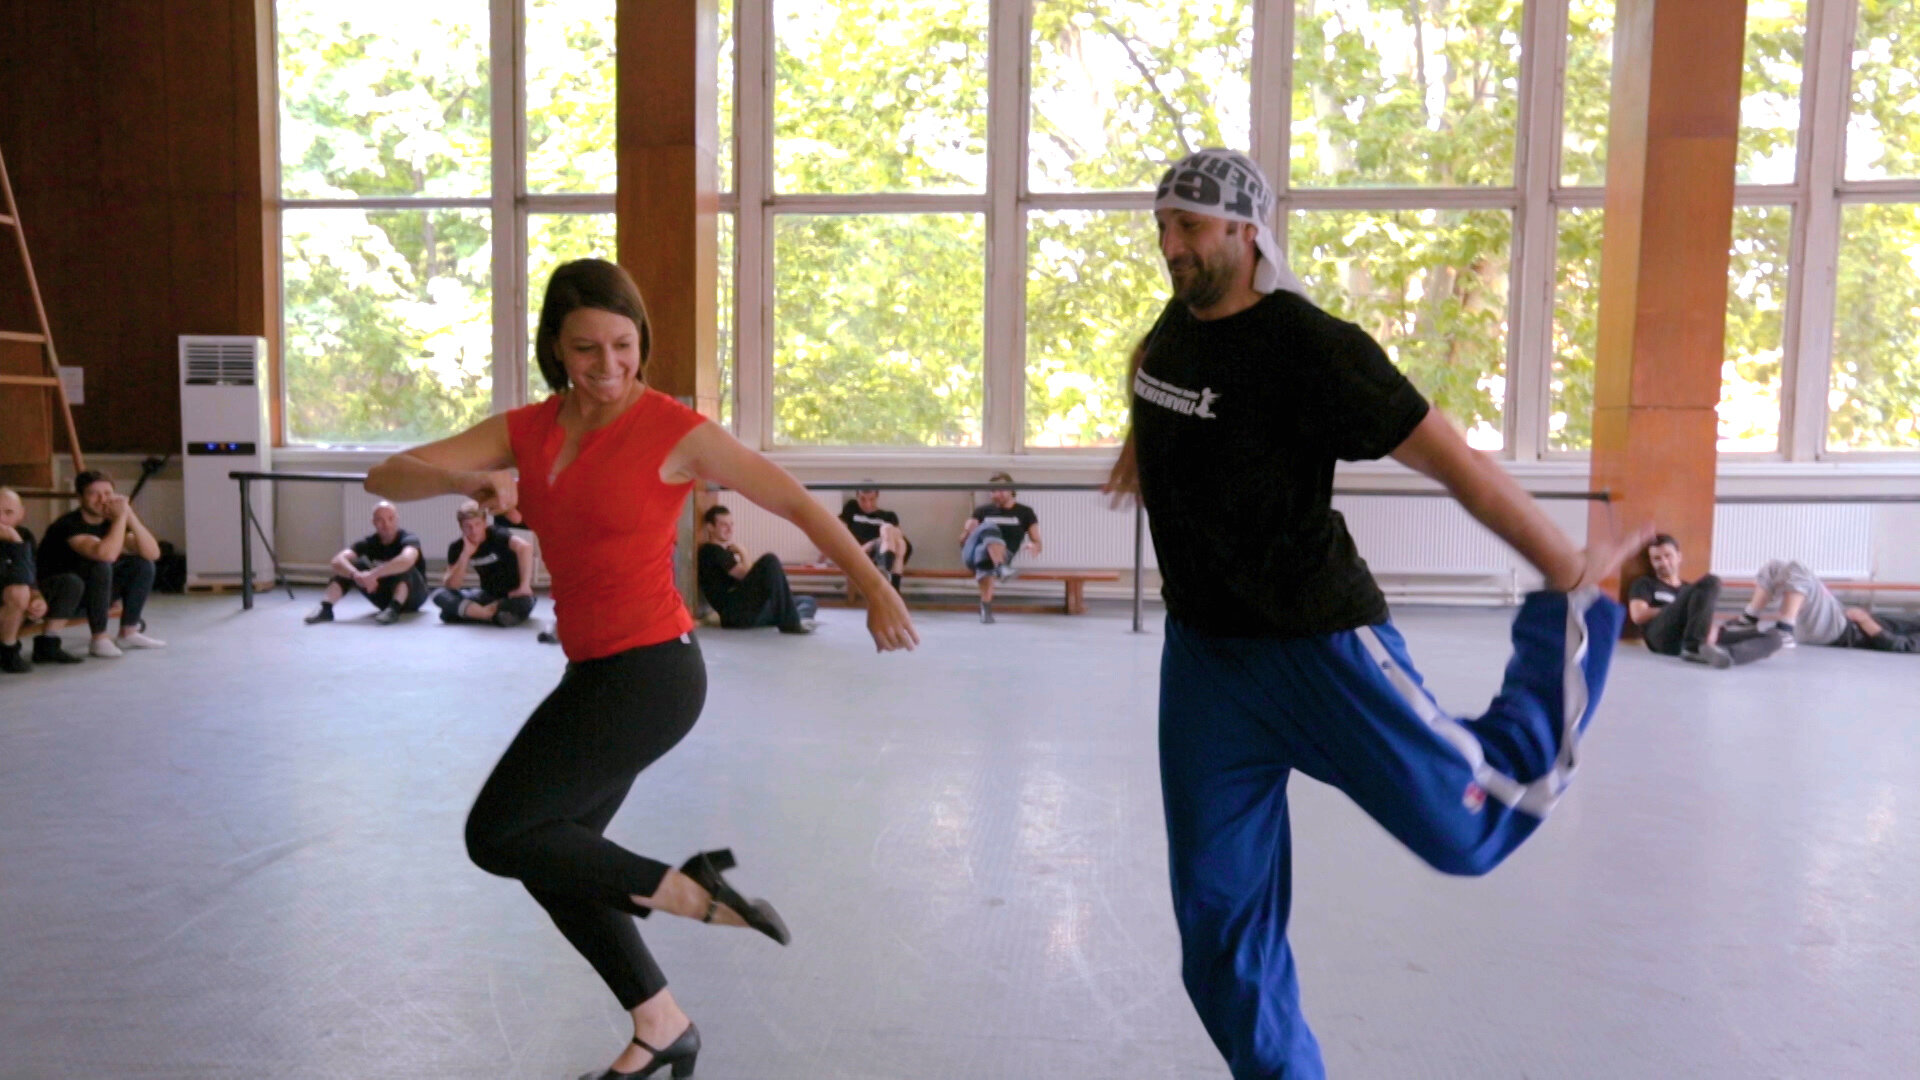 302 Republic of Georgia - Mickela Mallozzi dancing with Sukhishvili Georgian National Ballet 02 - photo by Marko Alonso.JPG